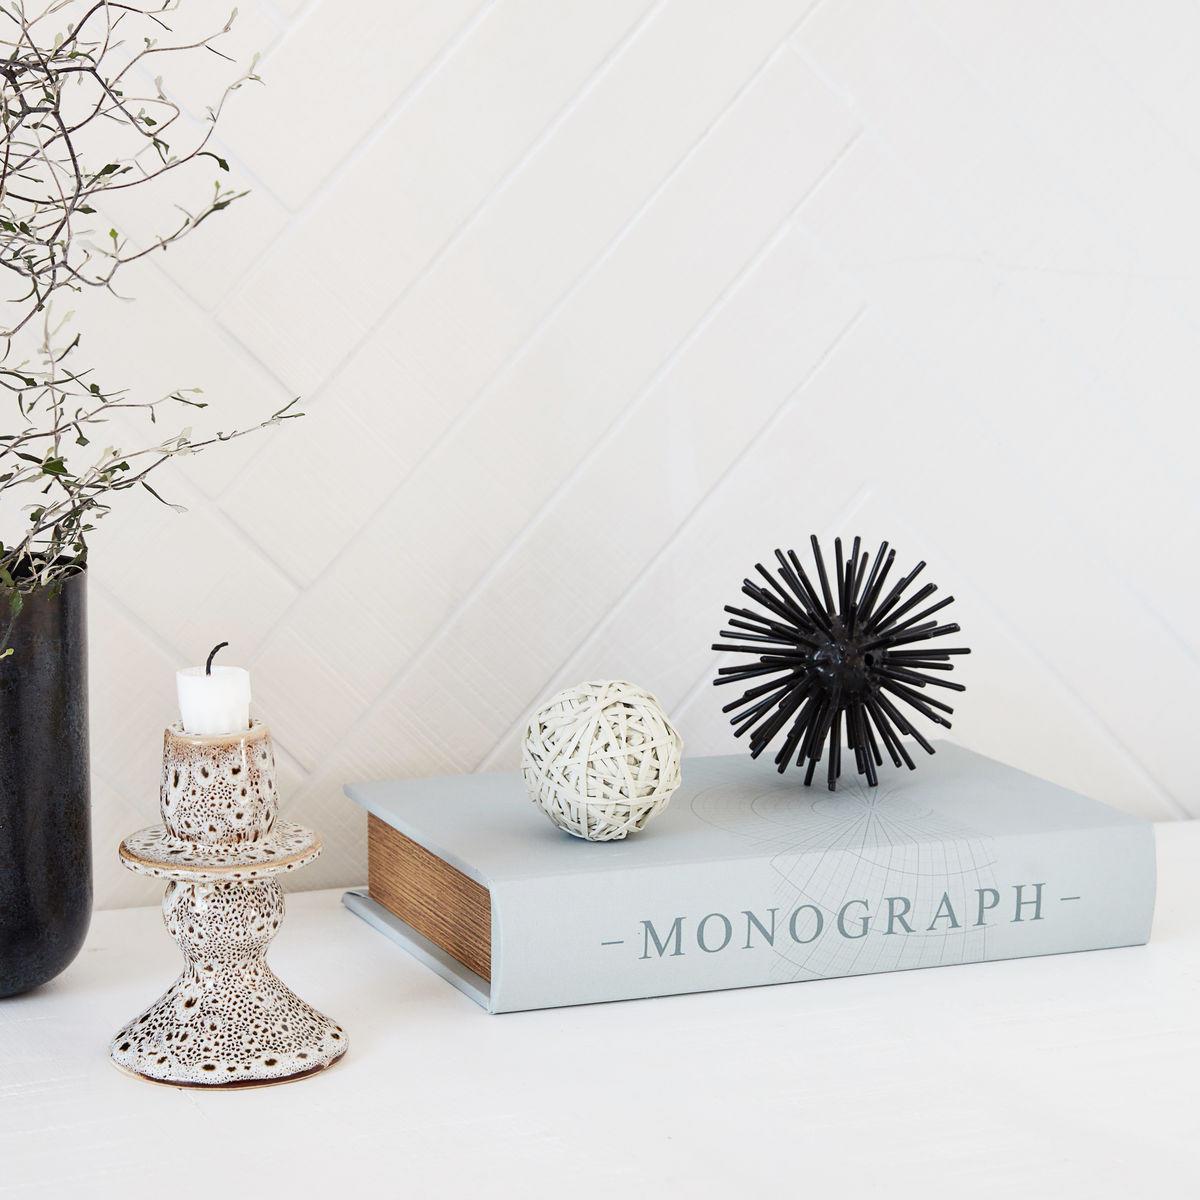 MONOGRAPH Kniha s úložným prostorem Grey, šedá barva, dřevo